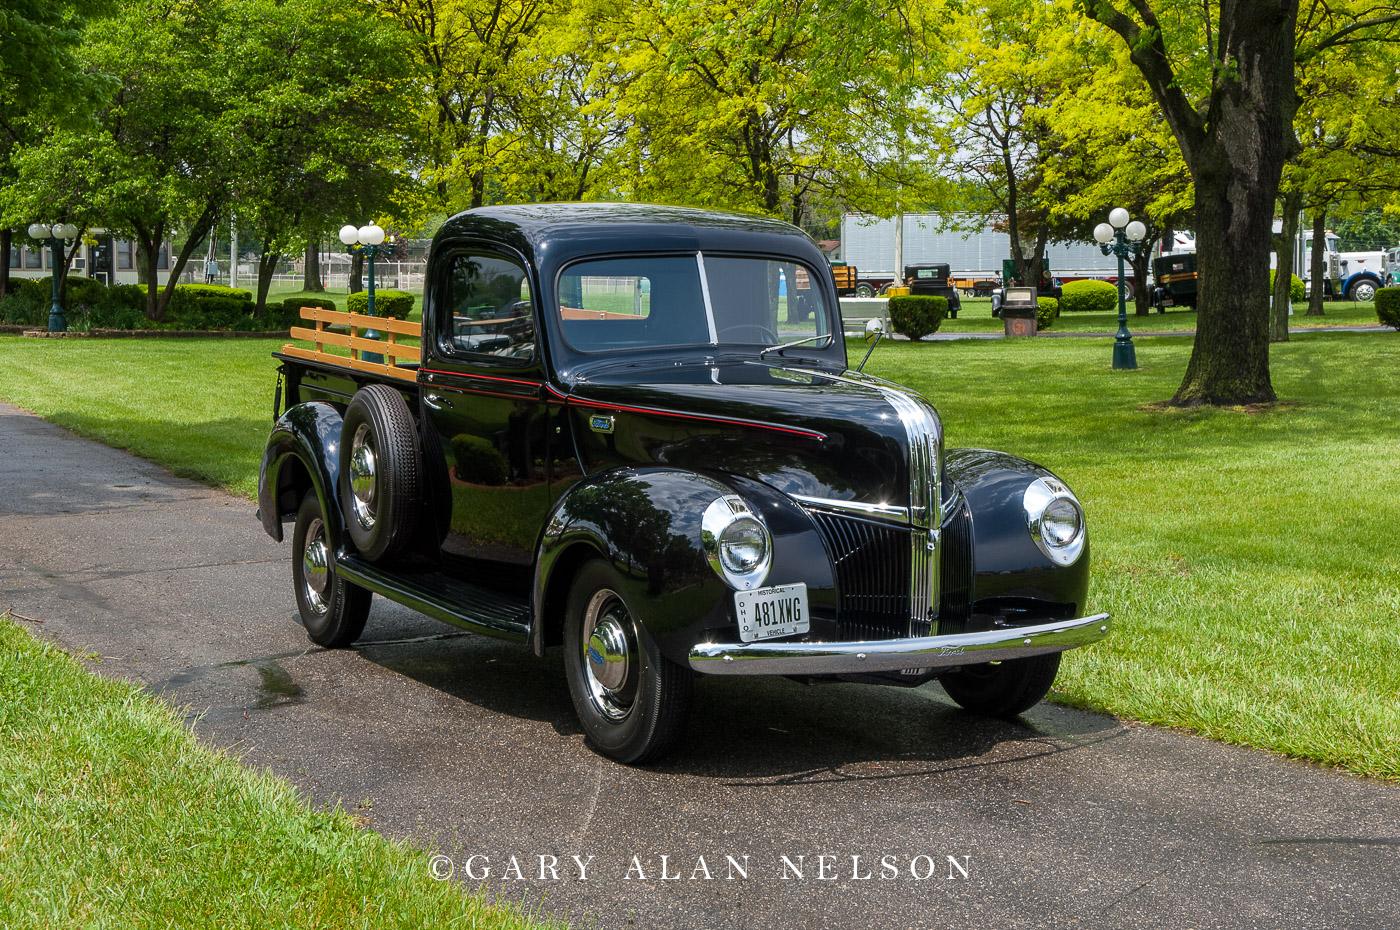 VT-11-5-FO 1941 Ford V-8 Pick Up